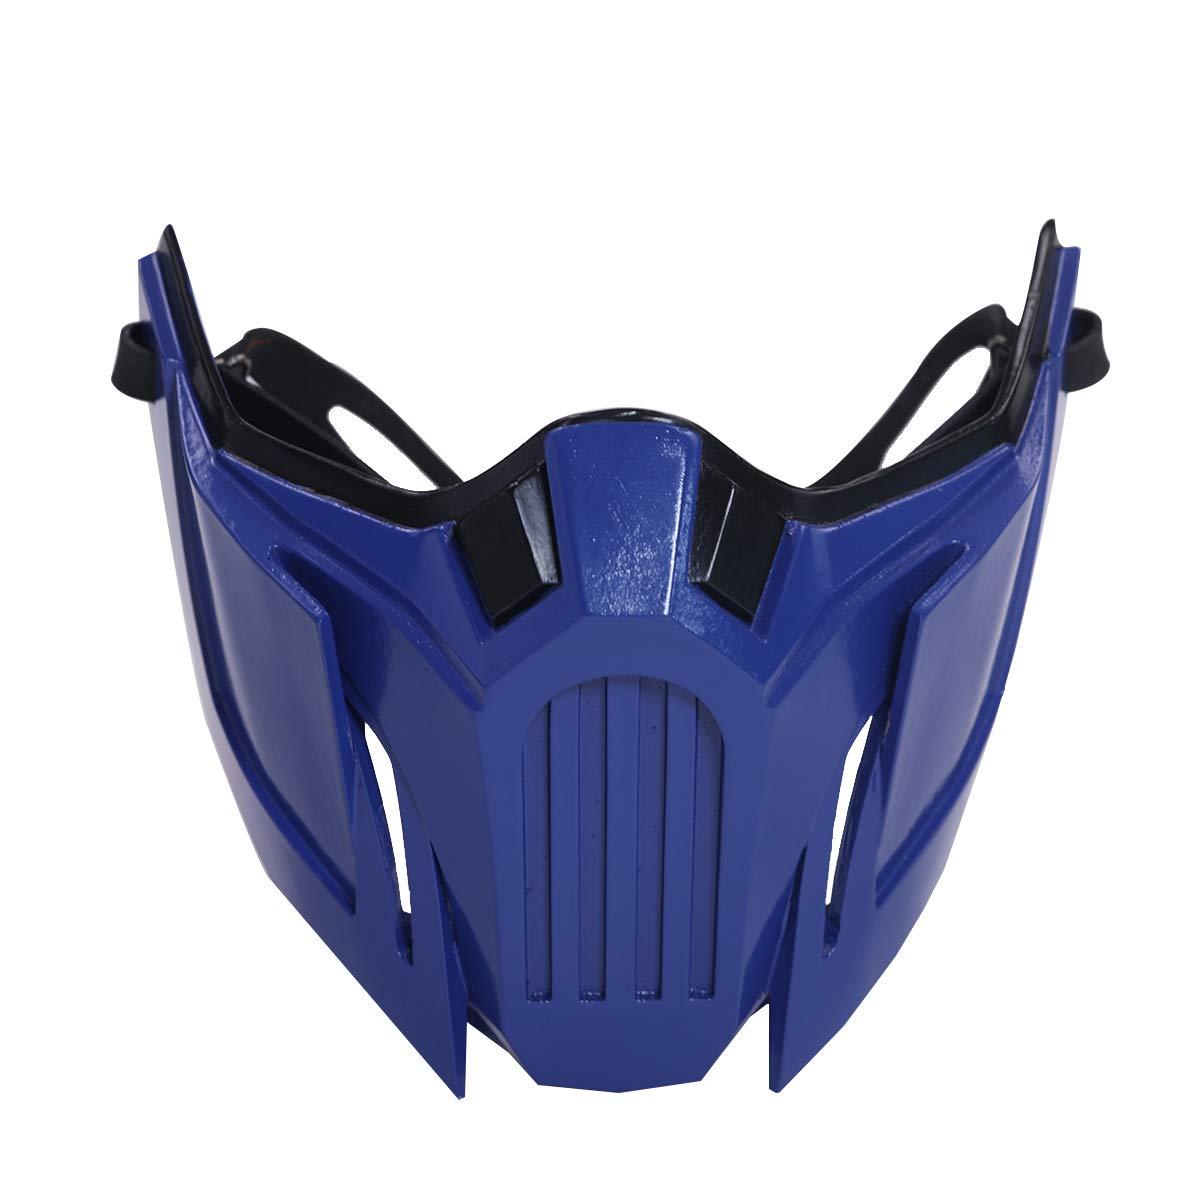 Newest Sub Zero Mask Mortal Kombat 11 Cosplay Costume Accessories